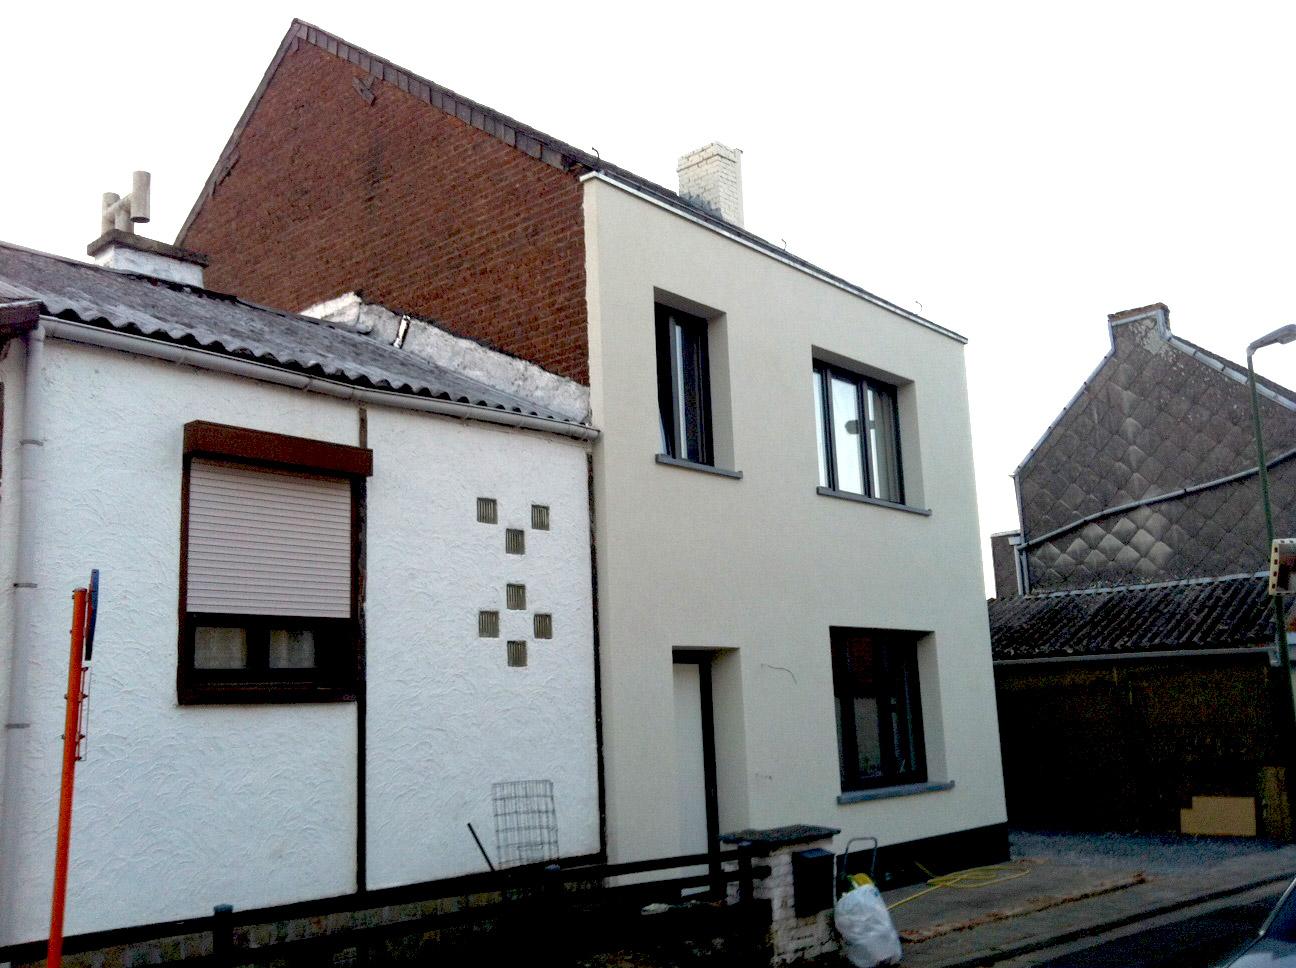 Entreprise d isolation et r novation de fa ade hainaut for Entreprise renovation facade